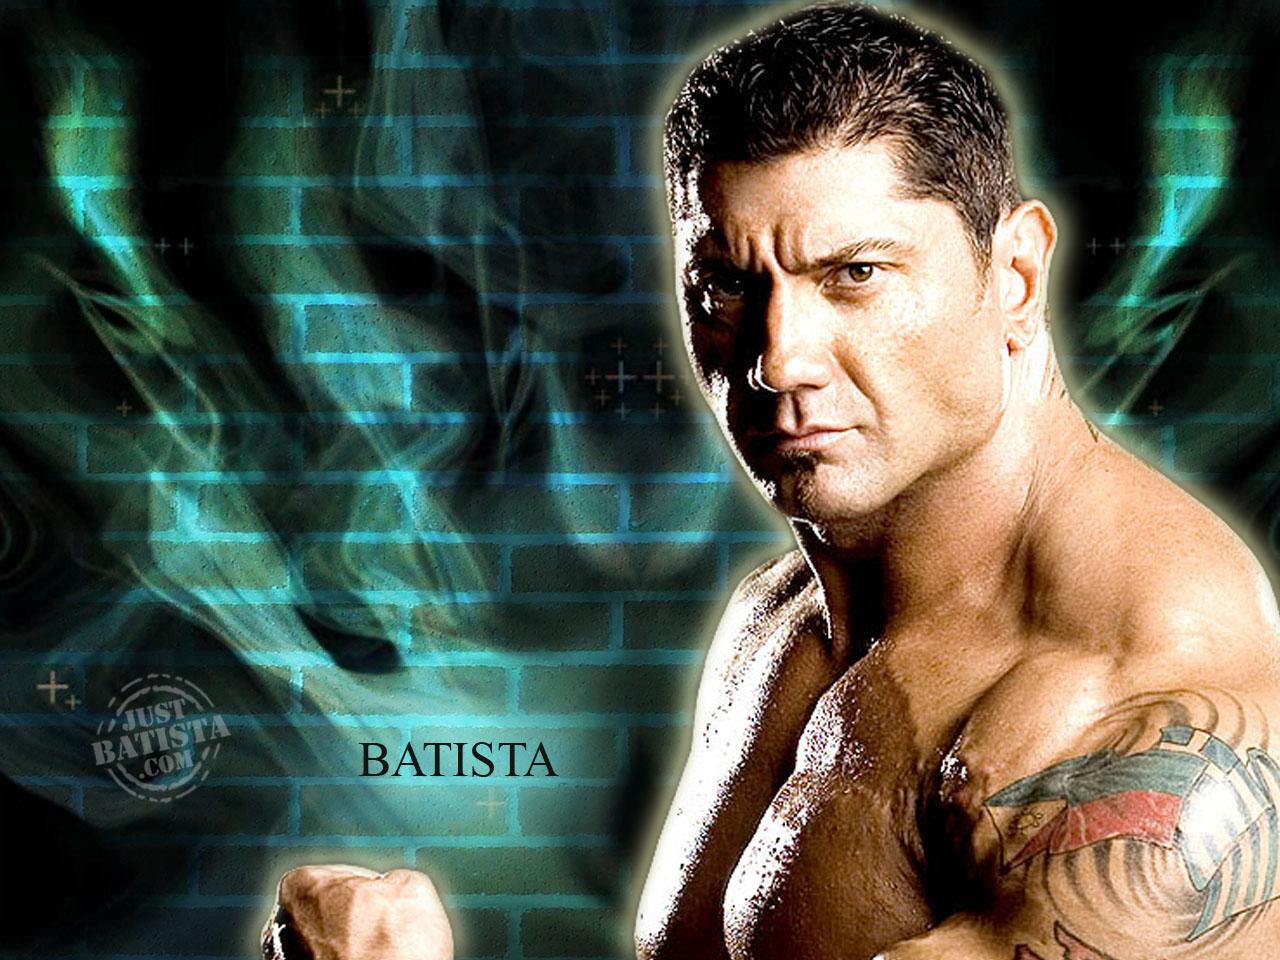 http://2.bp.blogspot.com/-NsgiTczViRQ/Tjhqq_B5v4I/AAAAAAAAAk0/Pdlx1b3gJbE/s1600/Batista-Wallpaper-8.jpg